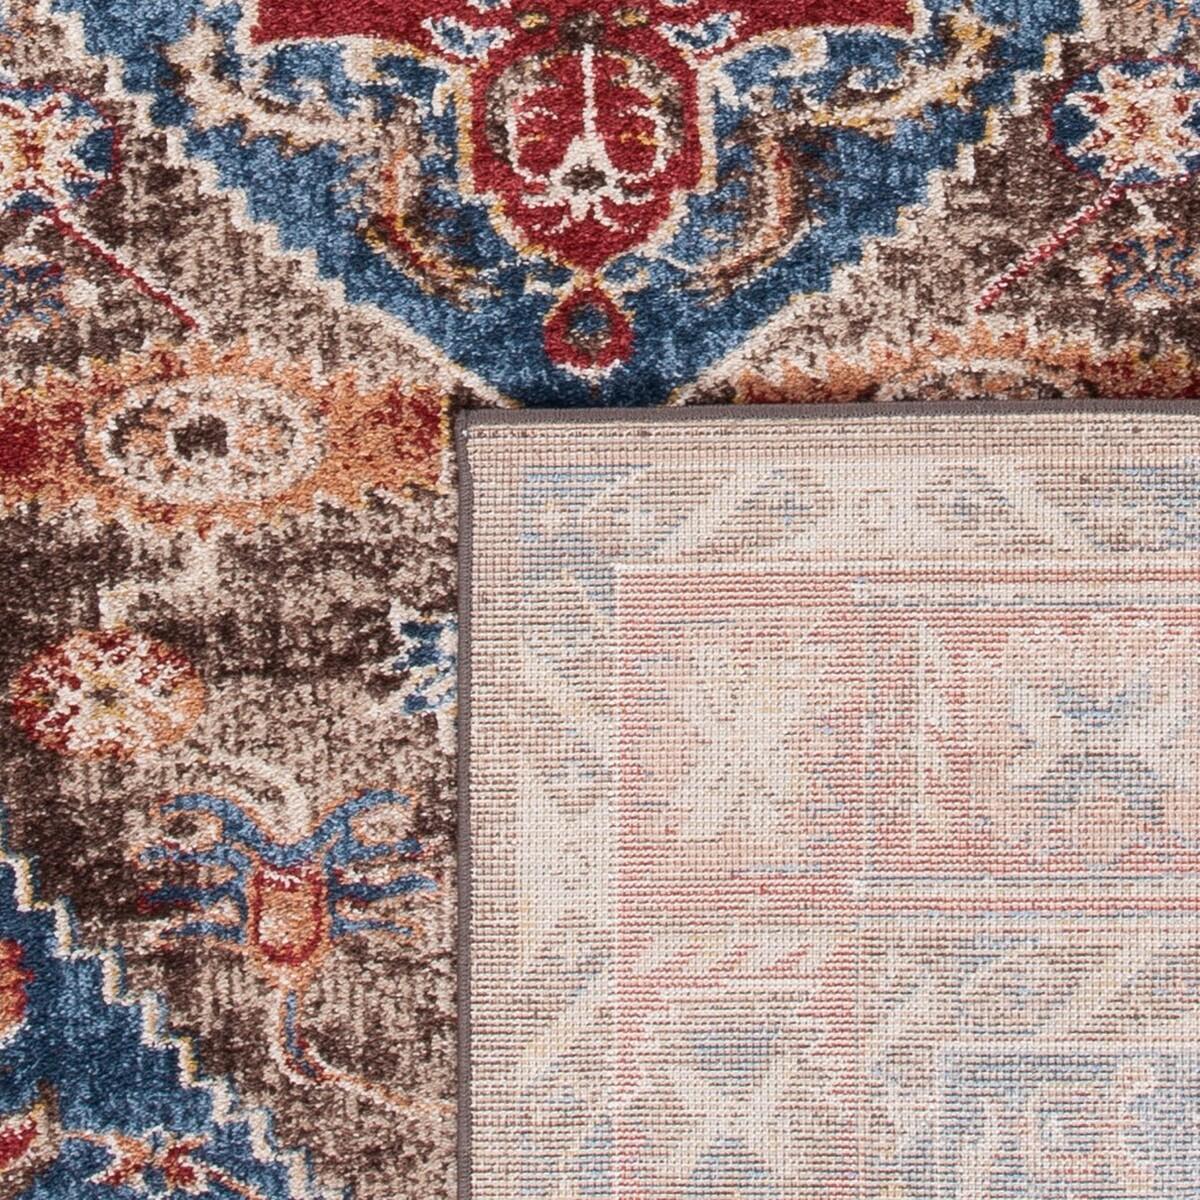 Rug Bij621c Bijar Area Rugs By Safavieh